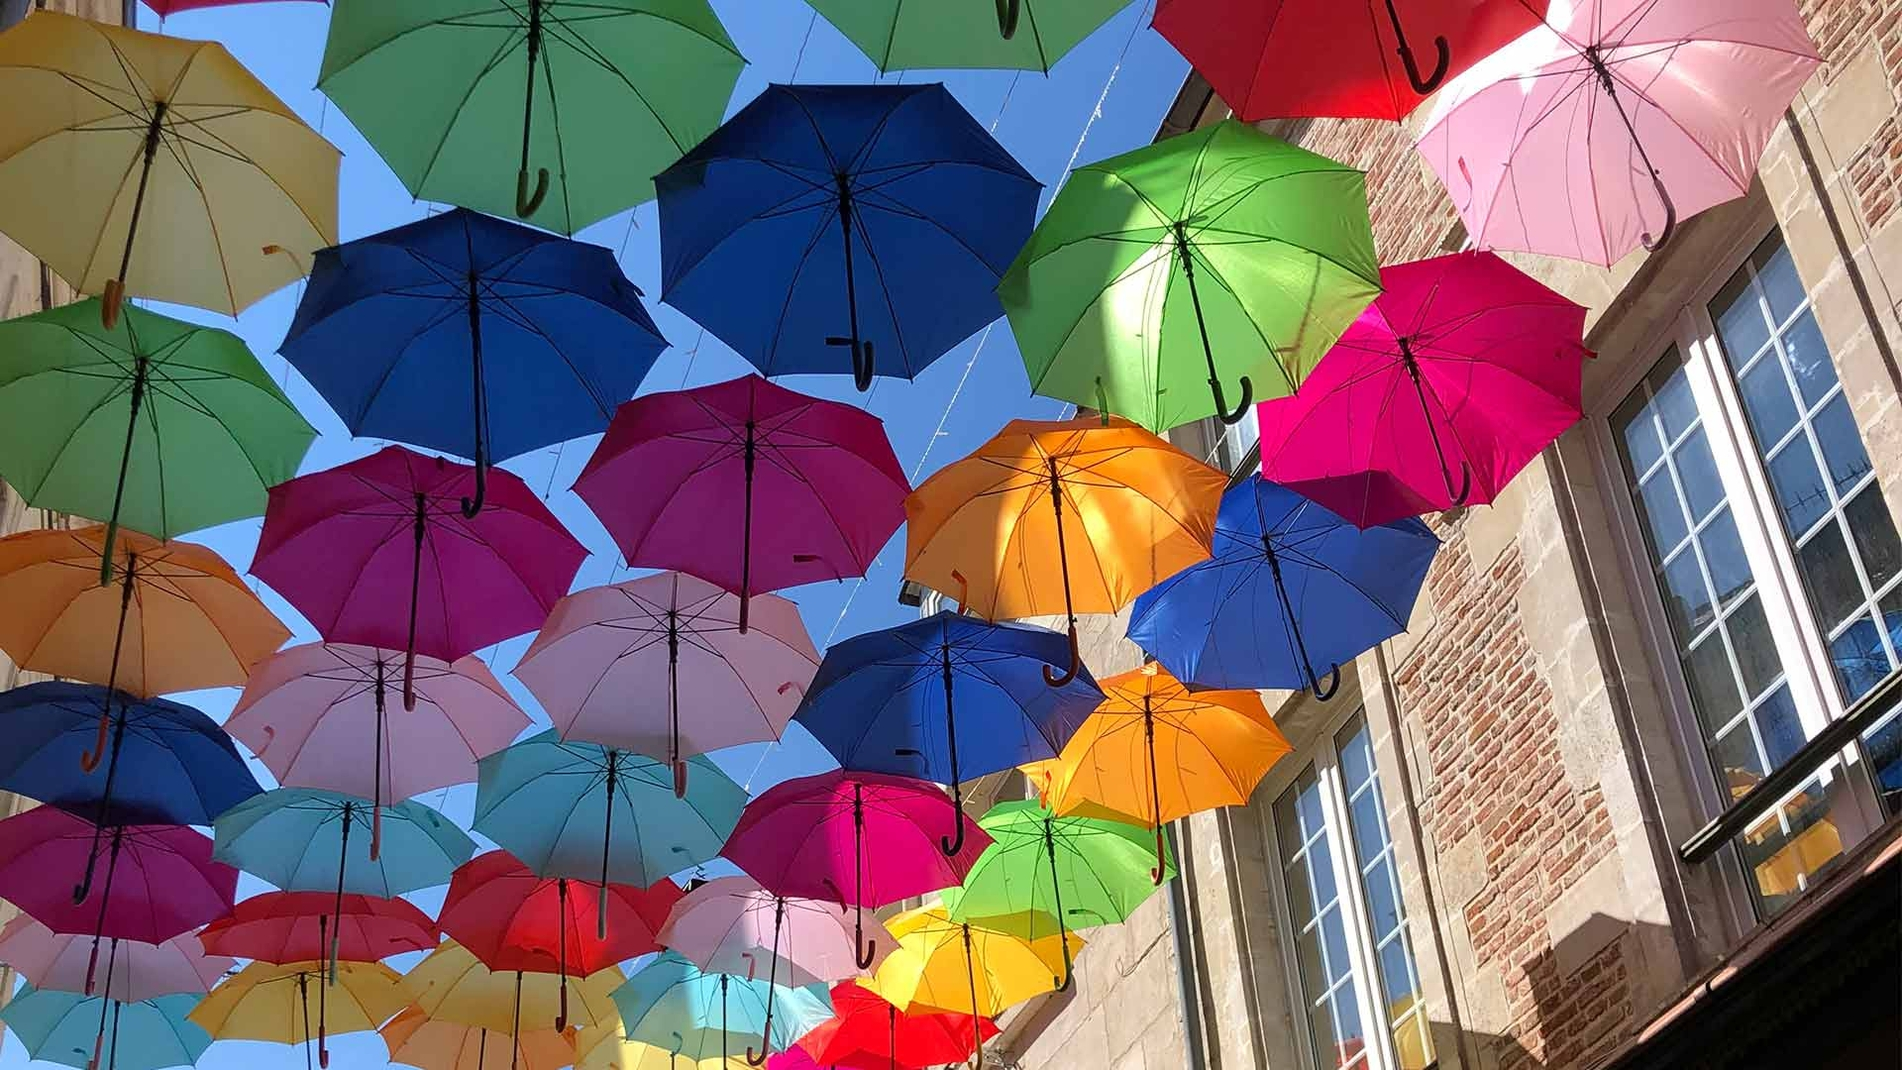 Umbrella Sky Project e Shiny Rain - Laon'19